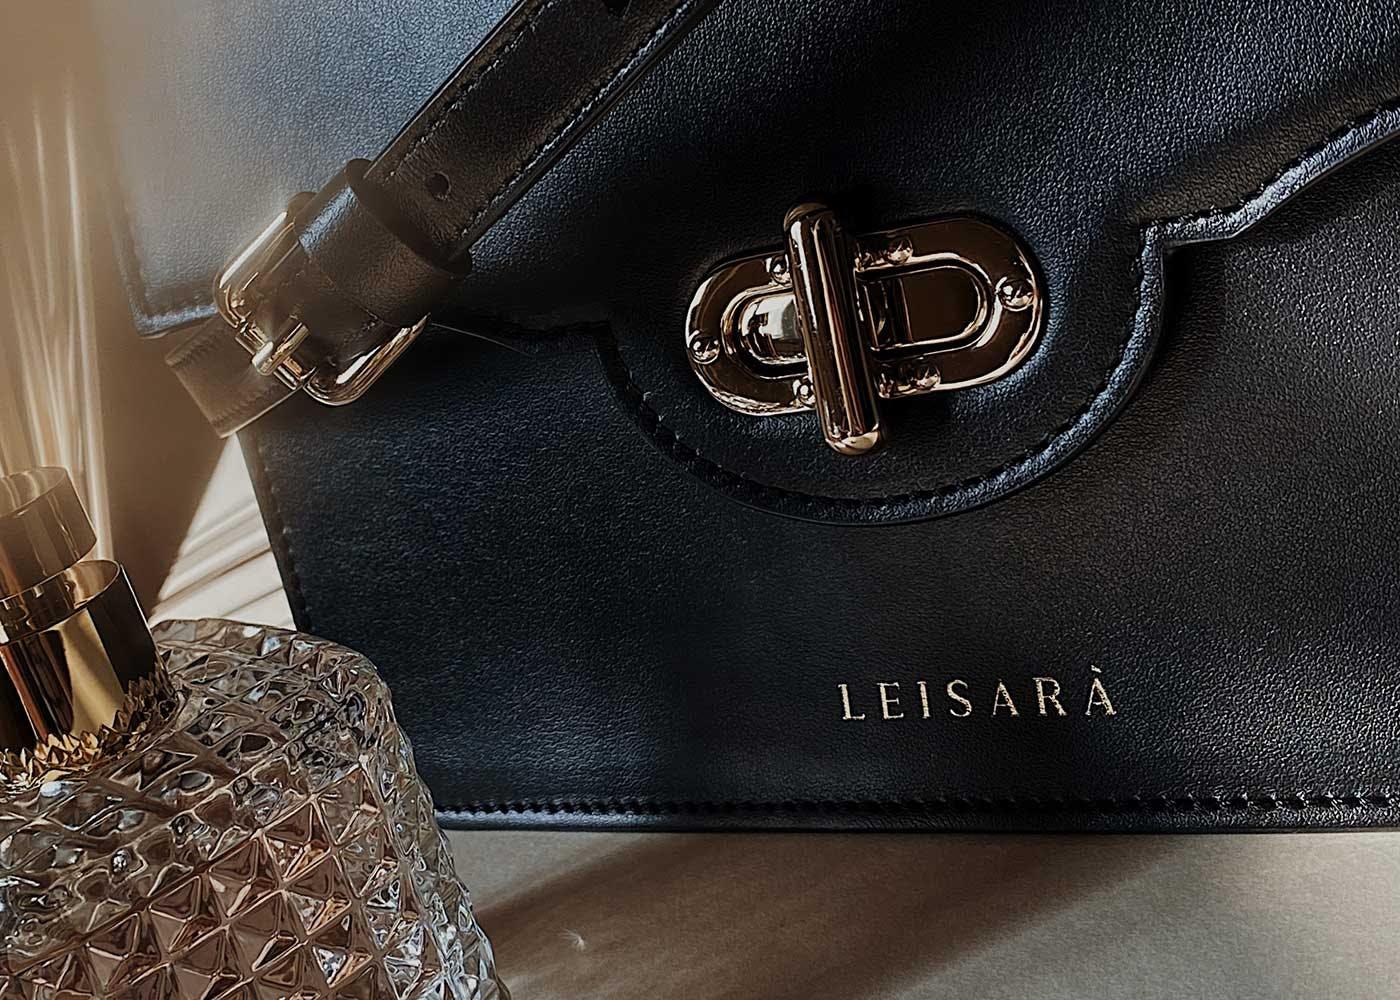 Leisara bag